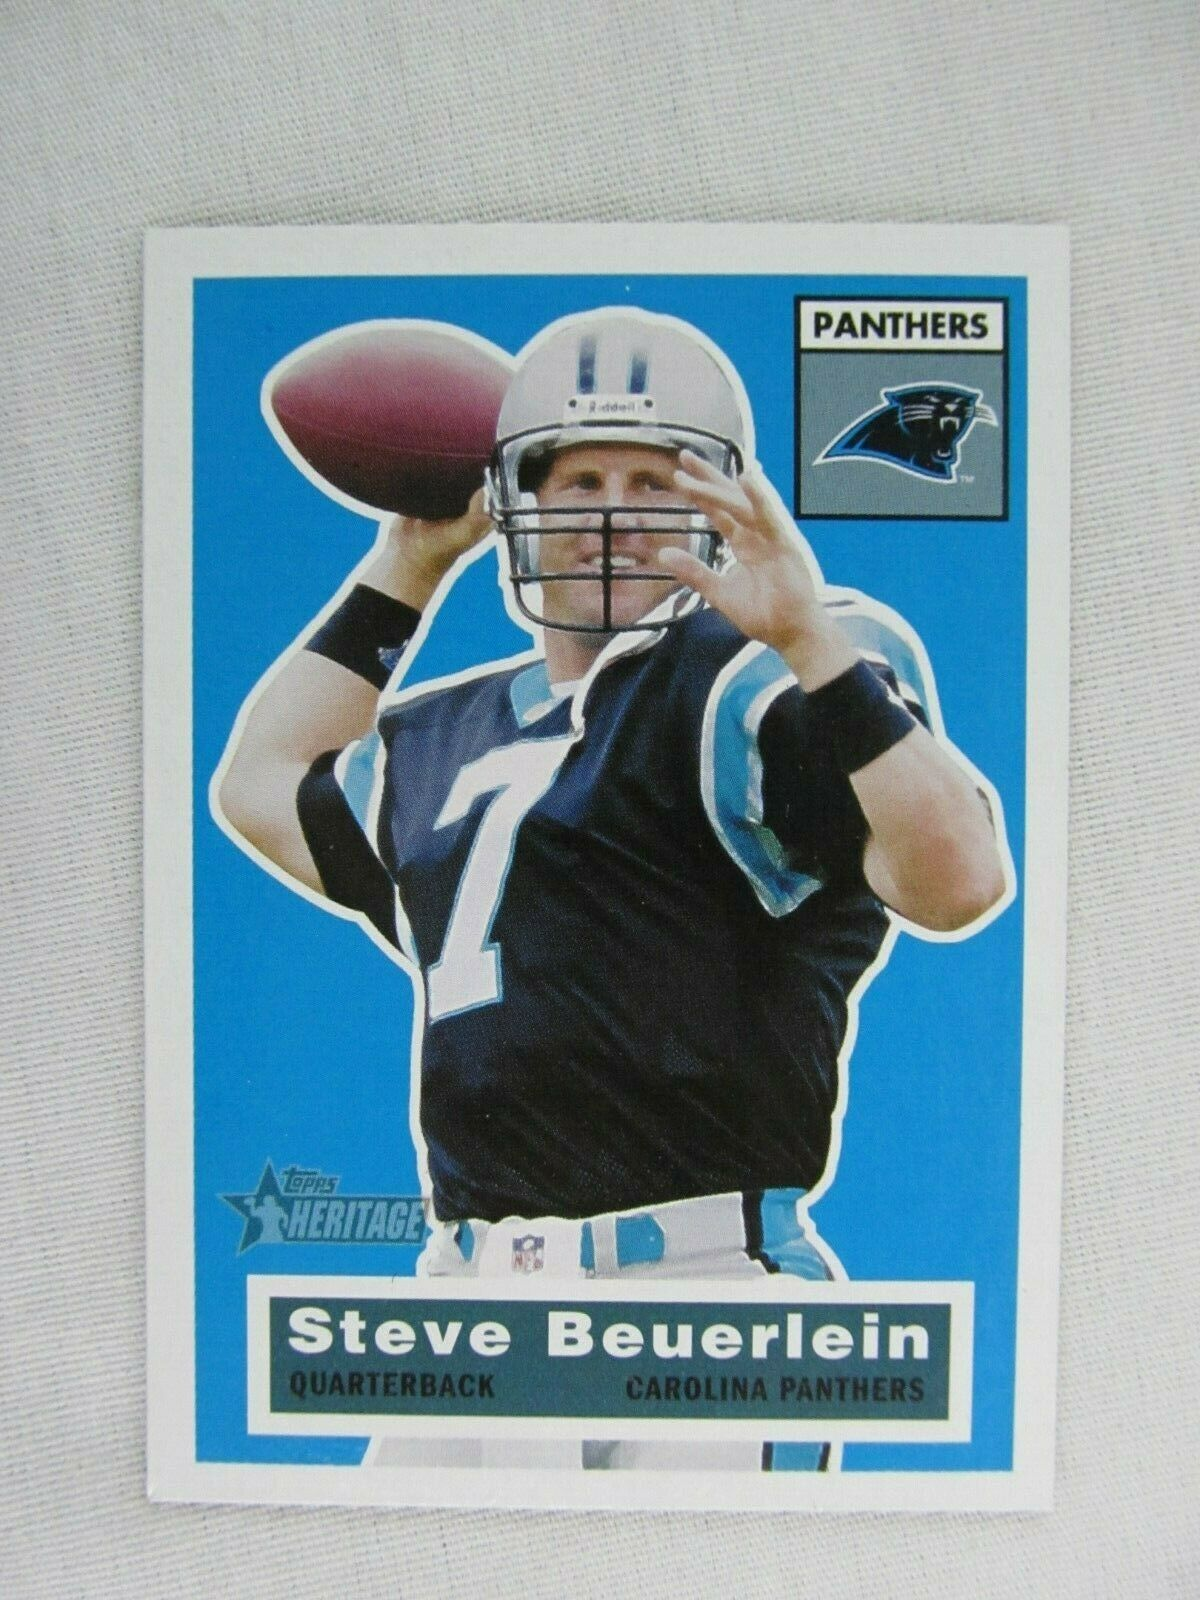 Steve Beuerlein Carolina Panthers 2001 Topps Heritage Football Card 107